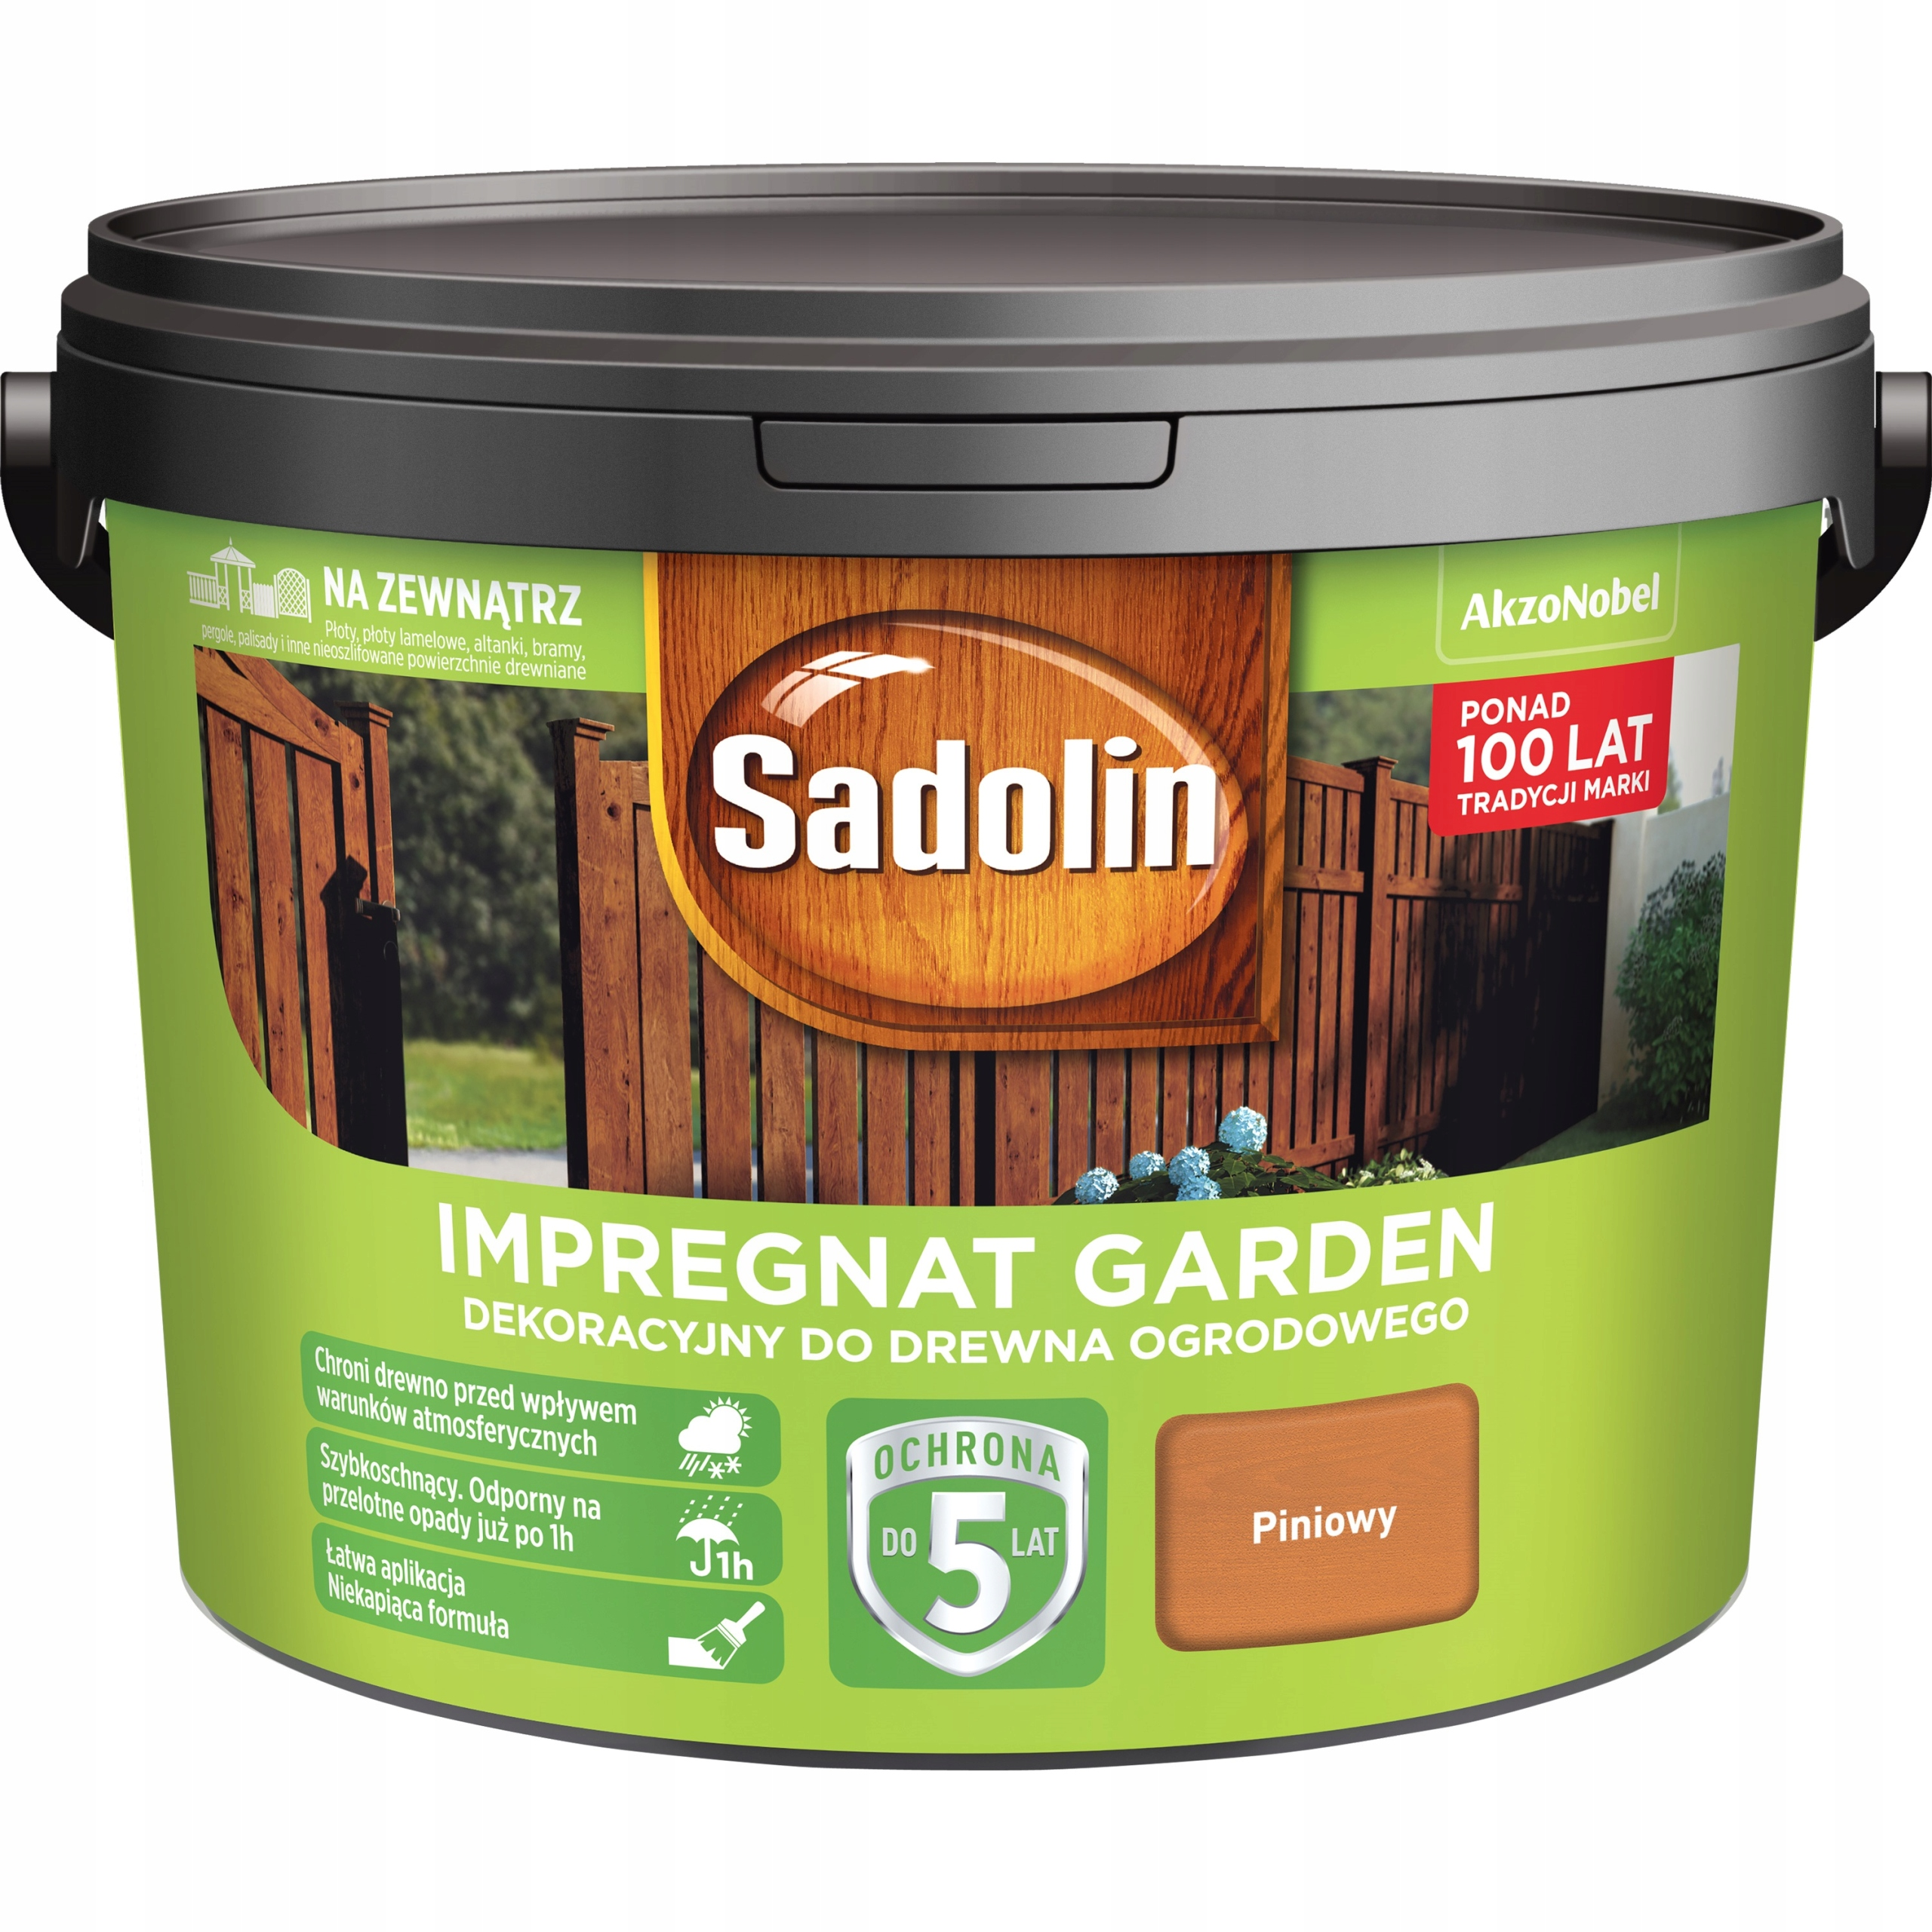 SADOLIN GARDEN - пропитка для дерева, piniowy, 9